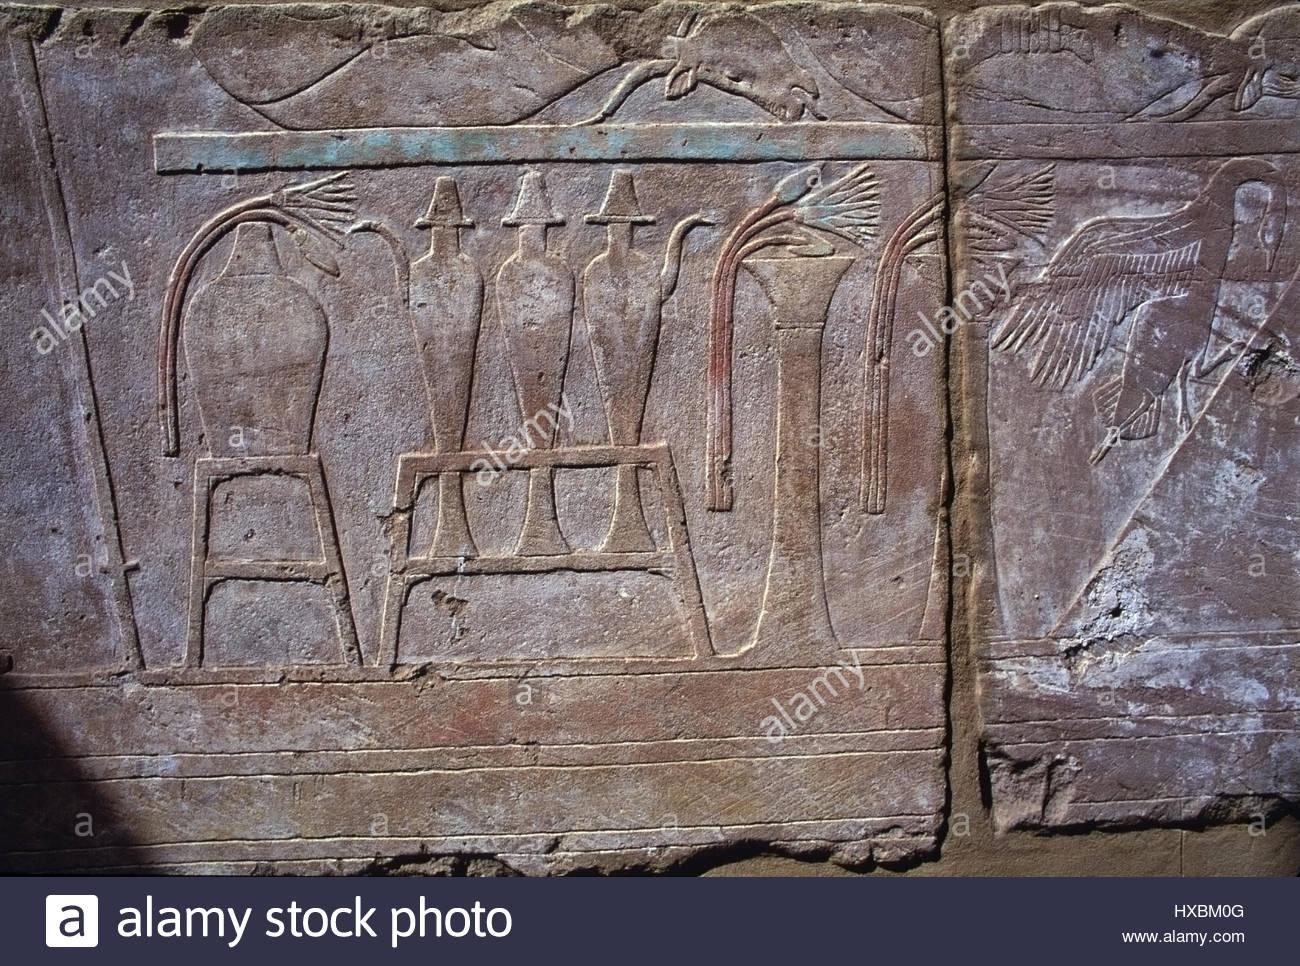 Egyptian offering stock photos